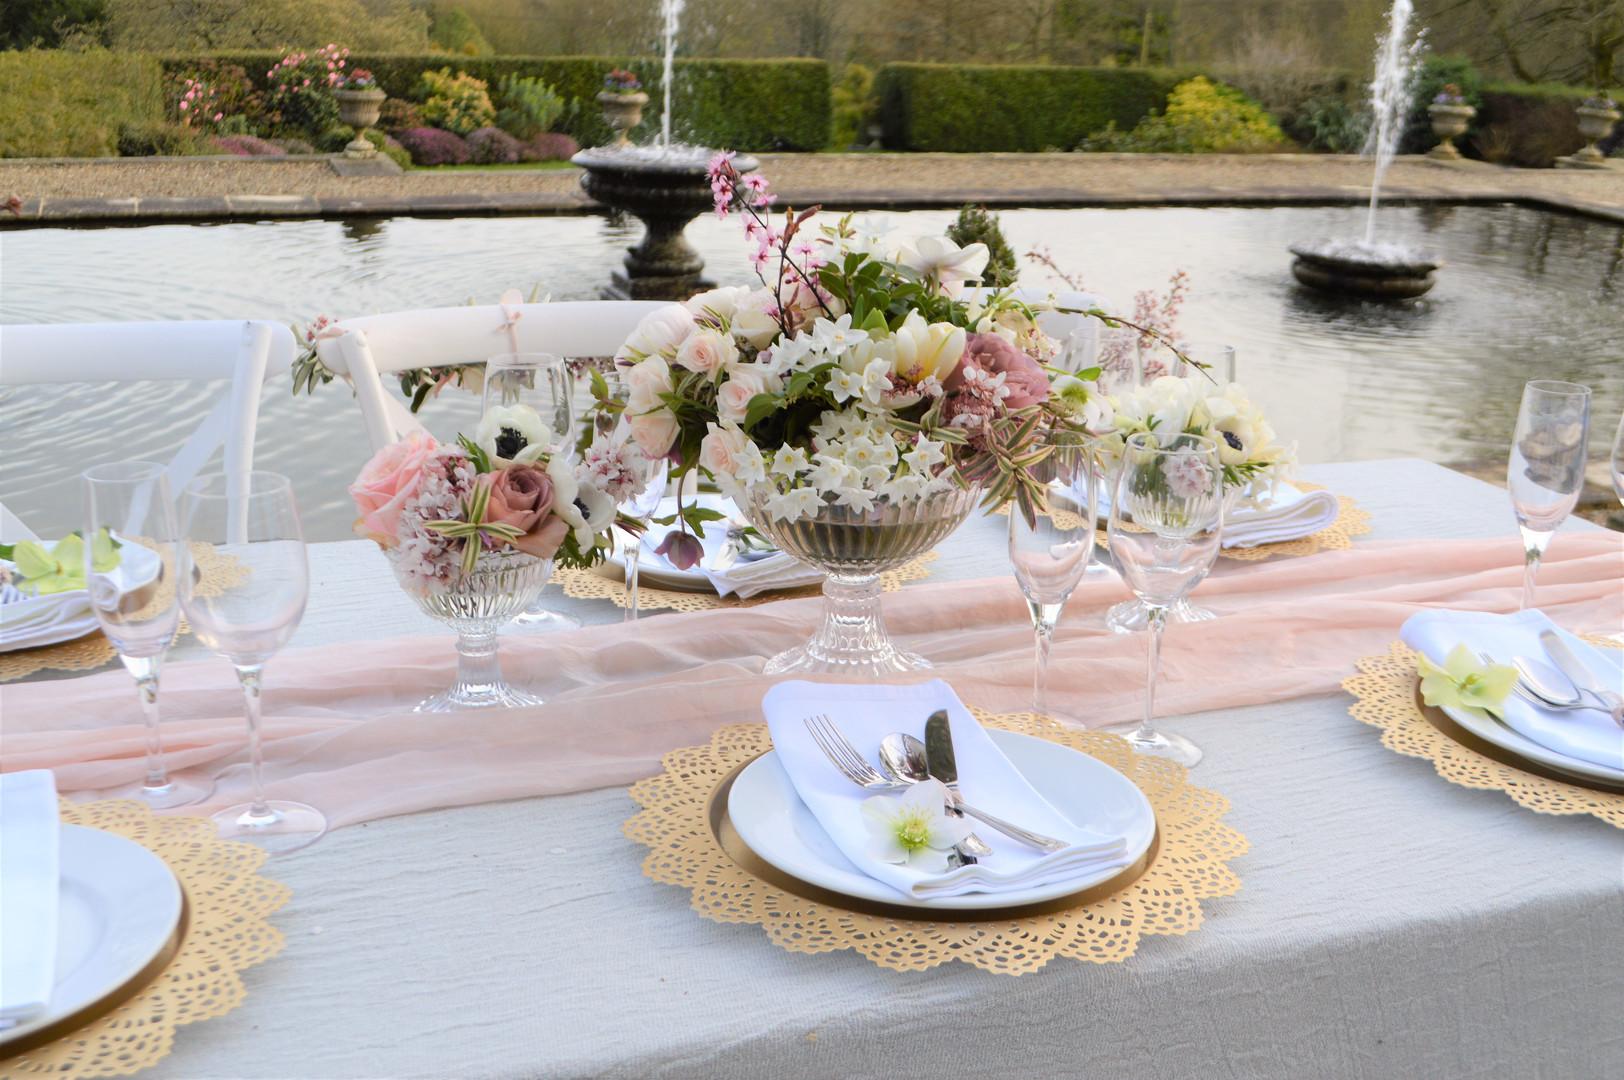 Floral table centre.JPG